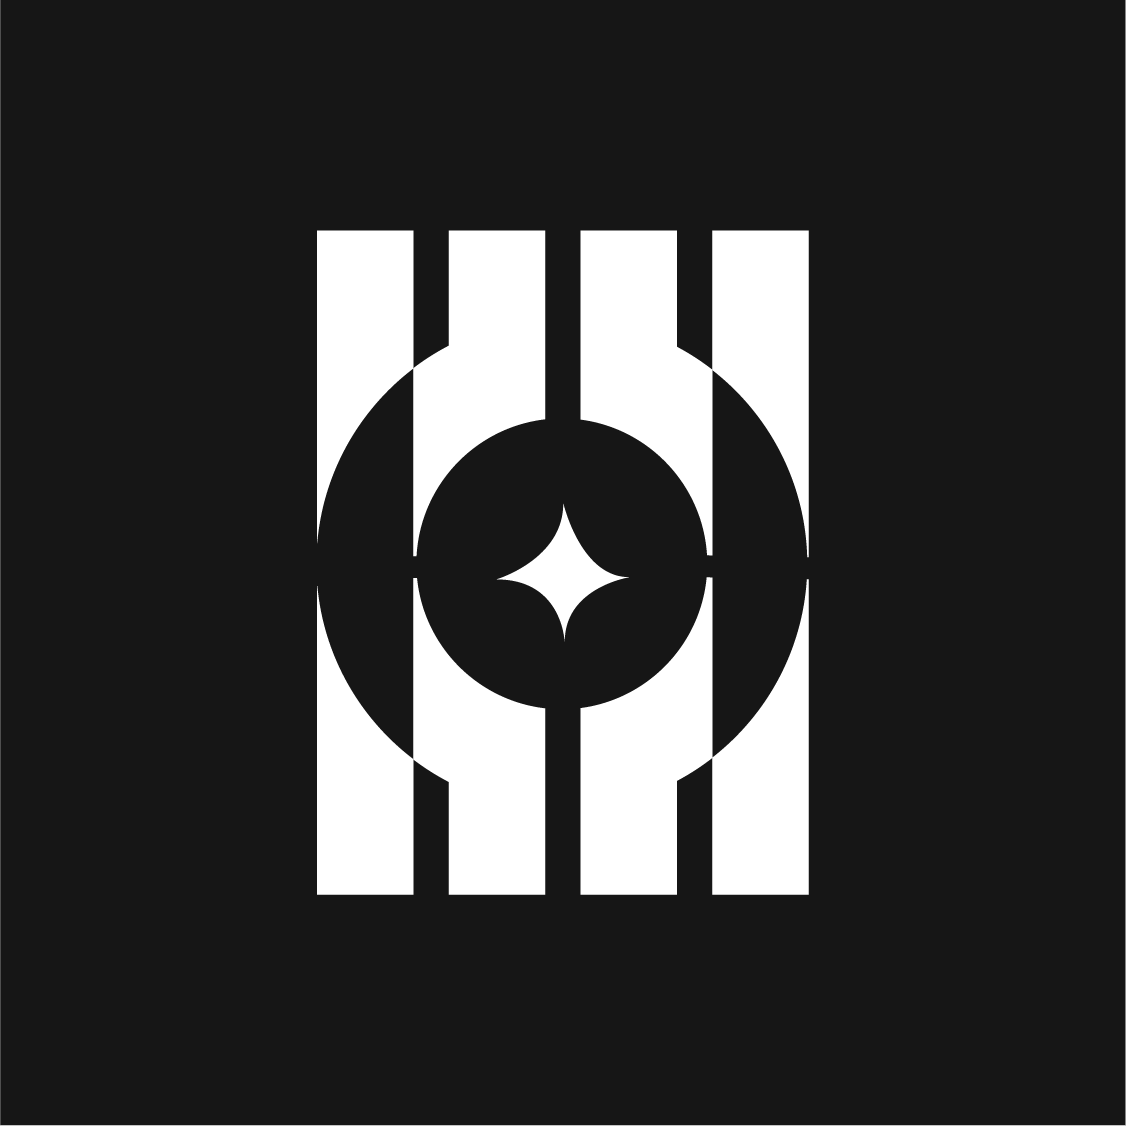 all-logos-2020-62